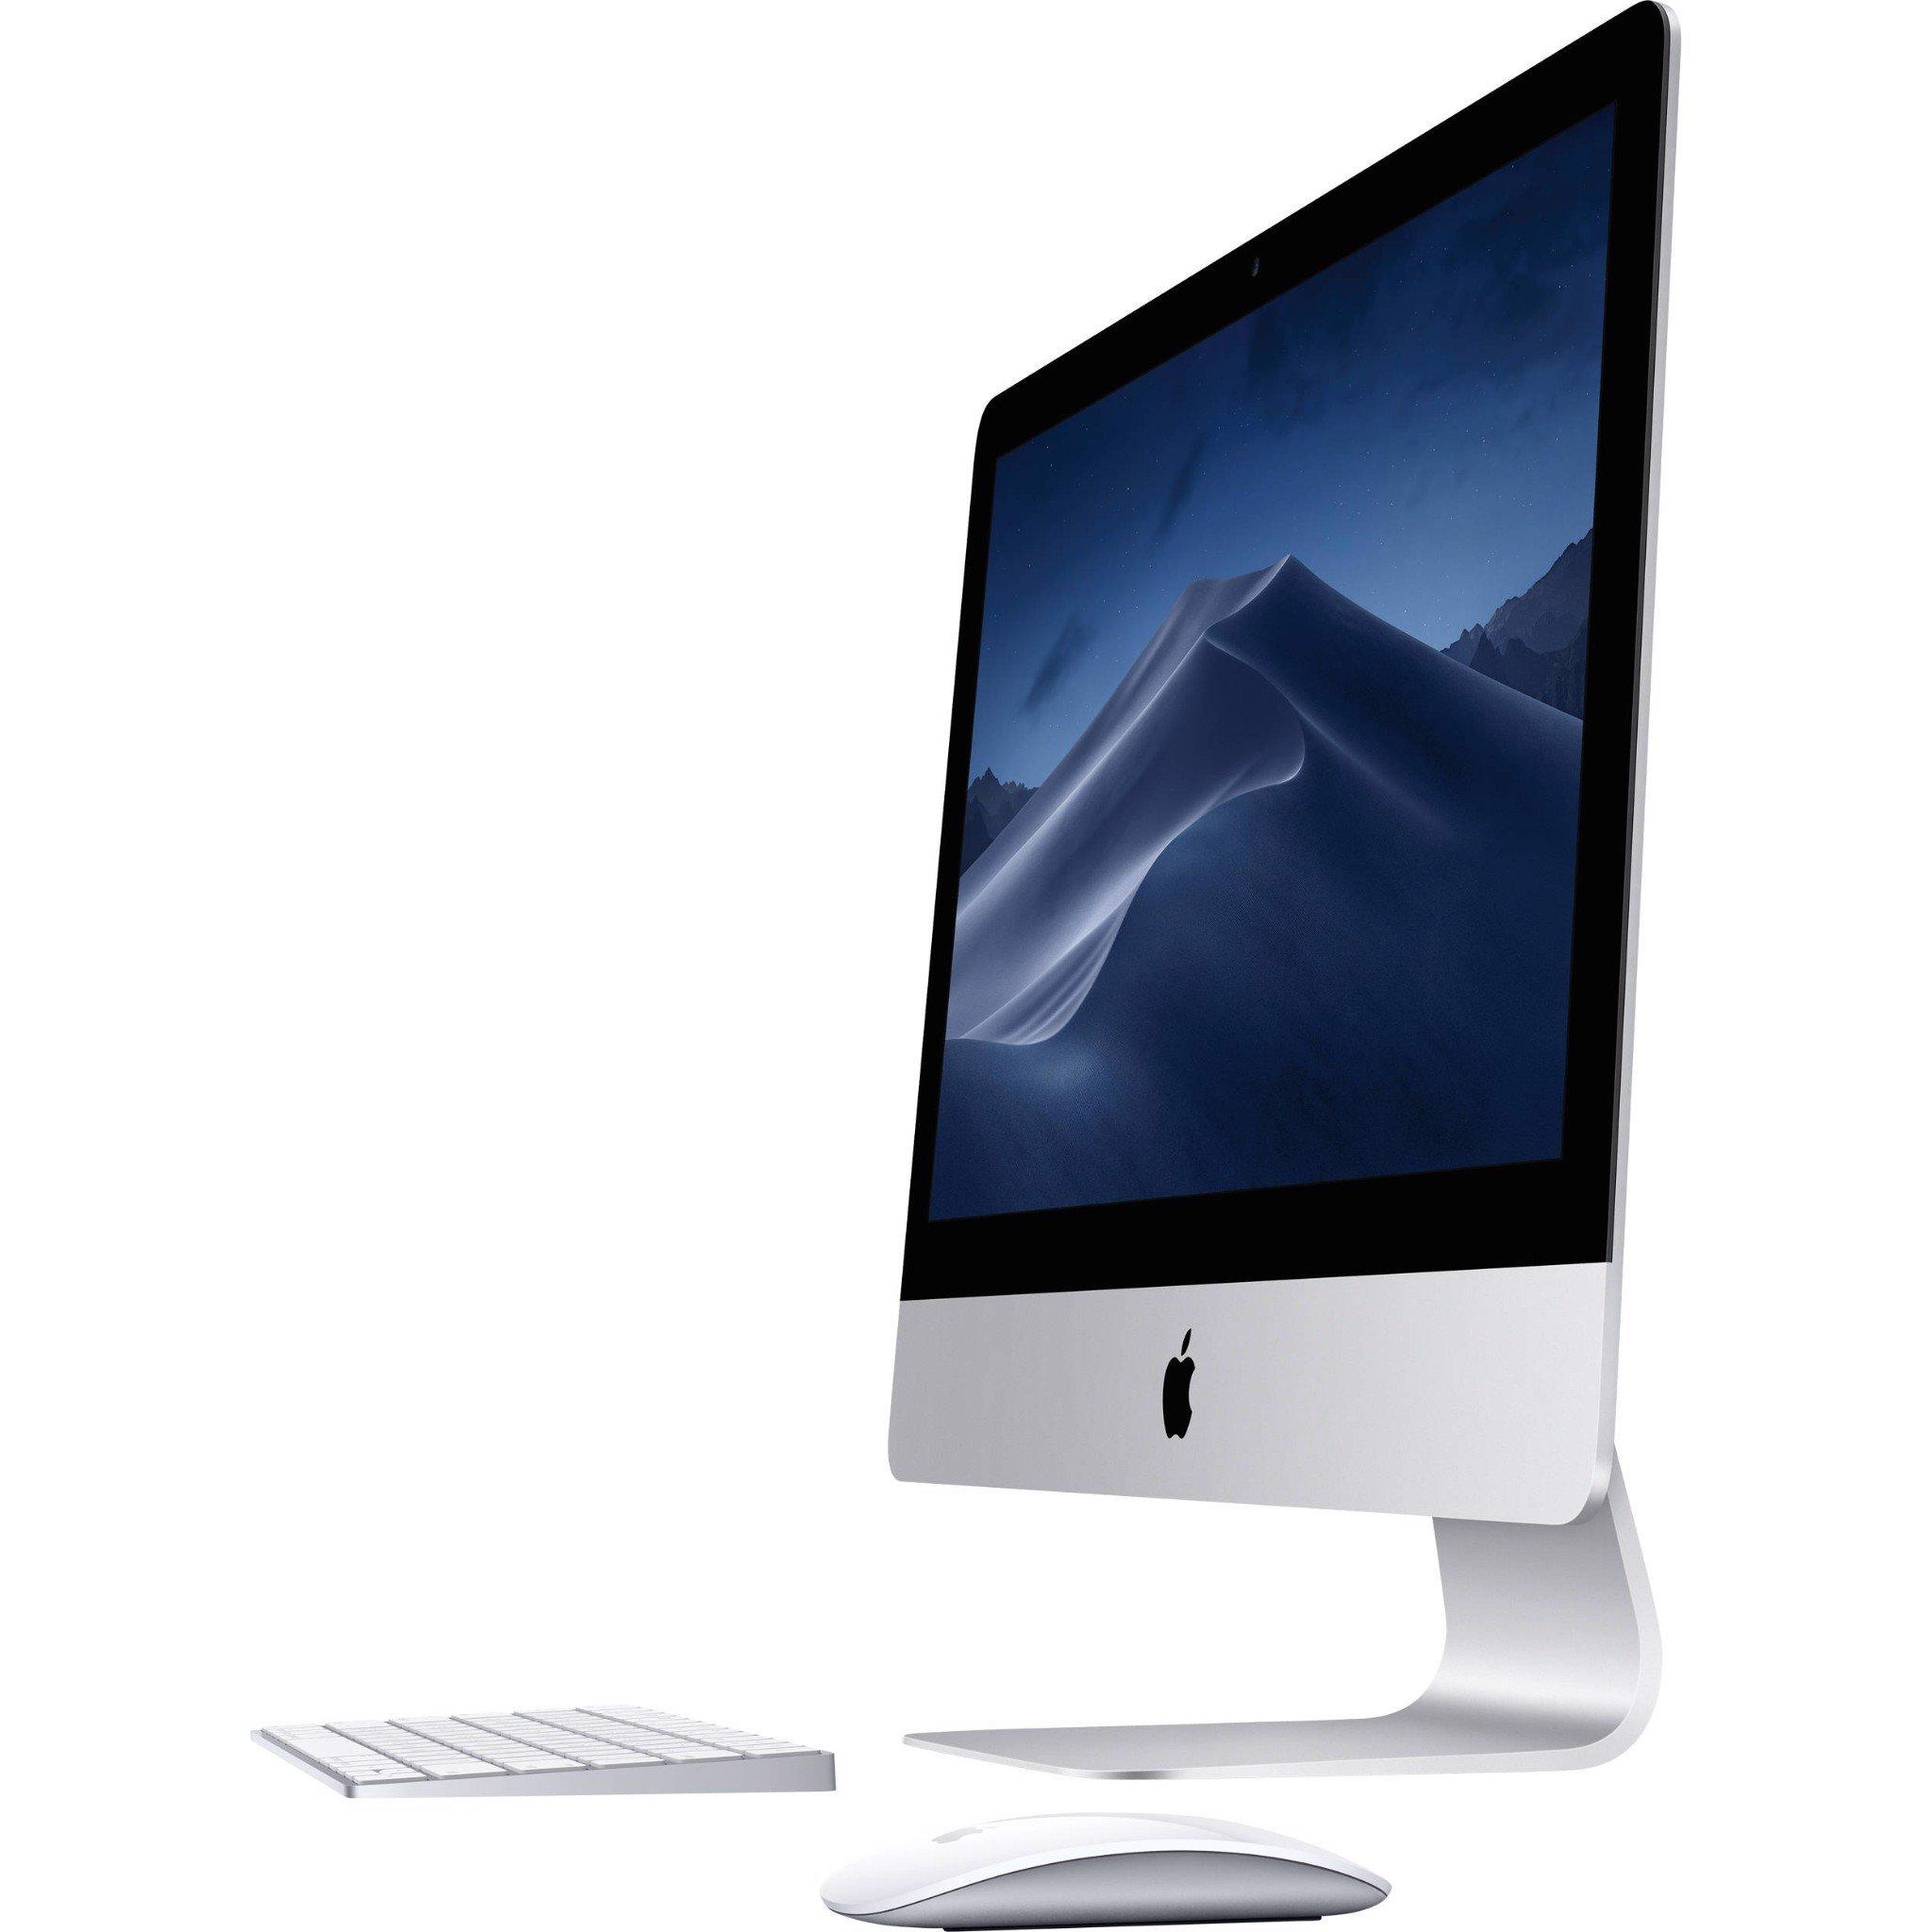 apple_z0vy_mrt42_01_21_5_imac_with_retina_1468511_3358e781653d4396ba9518ae59bff775_master.jpg